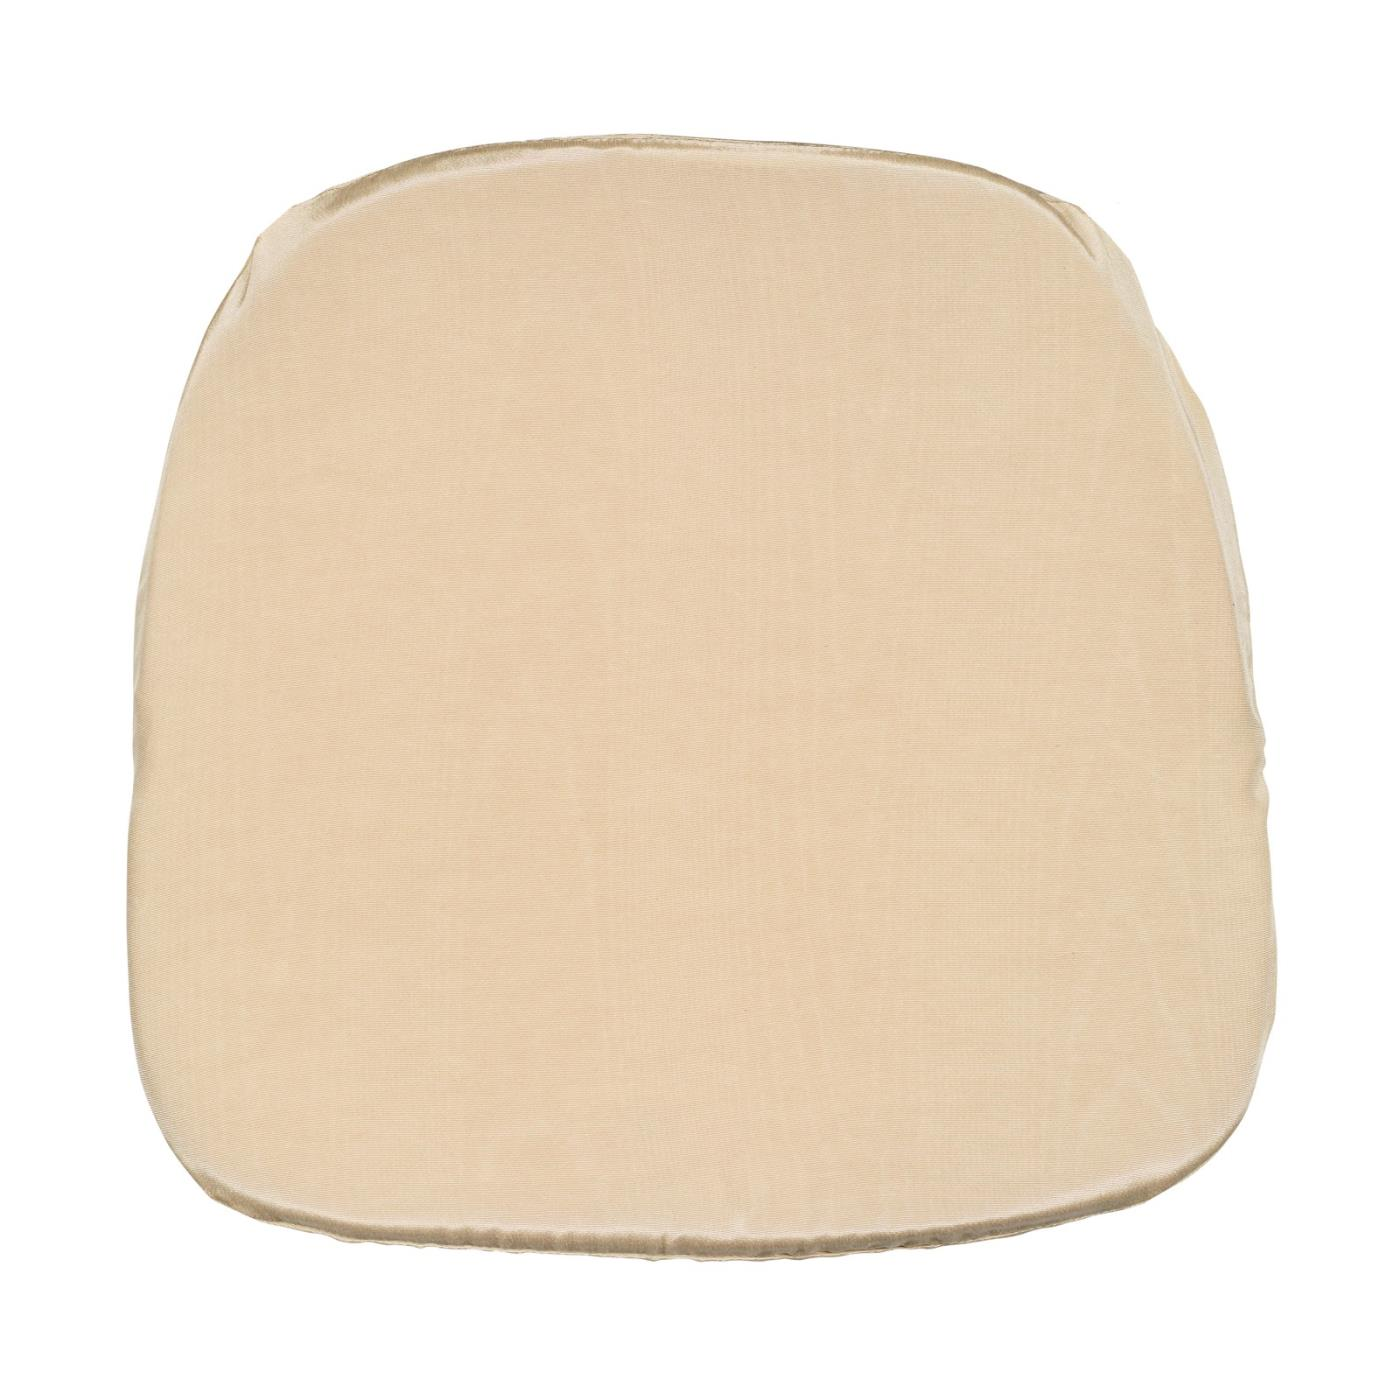 Bengaline Moire Seat Cushion - Ivory